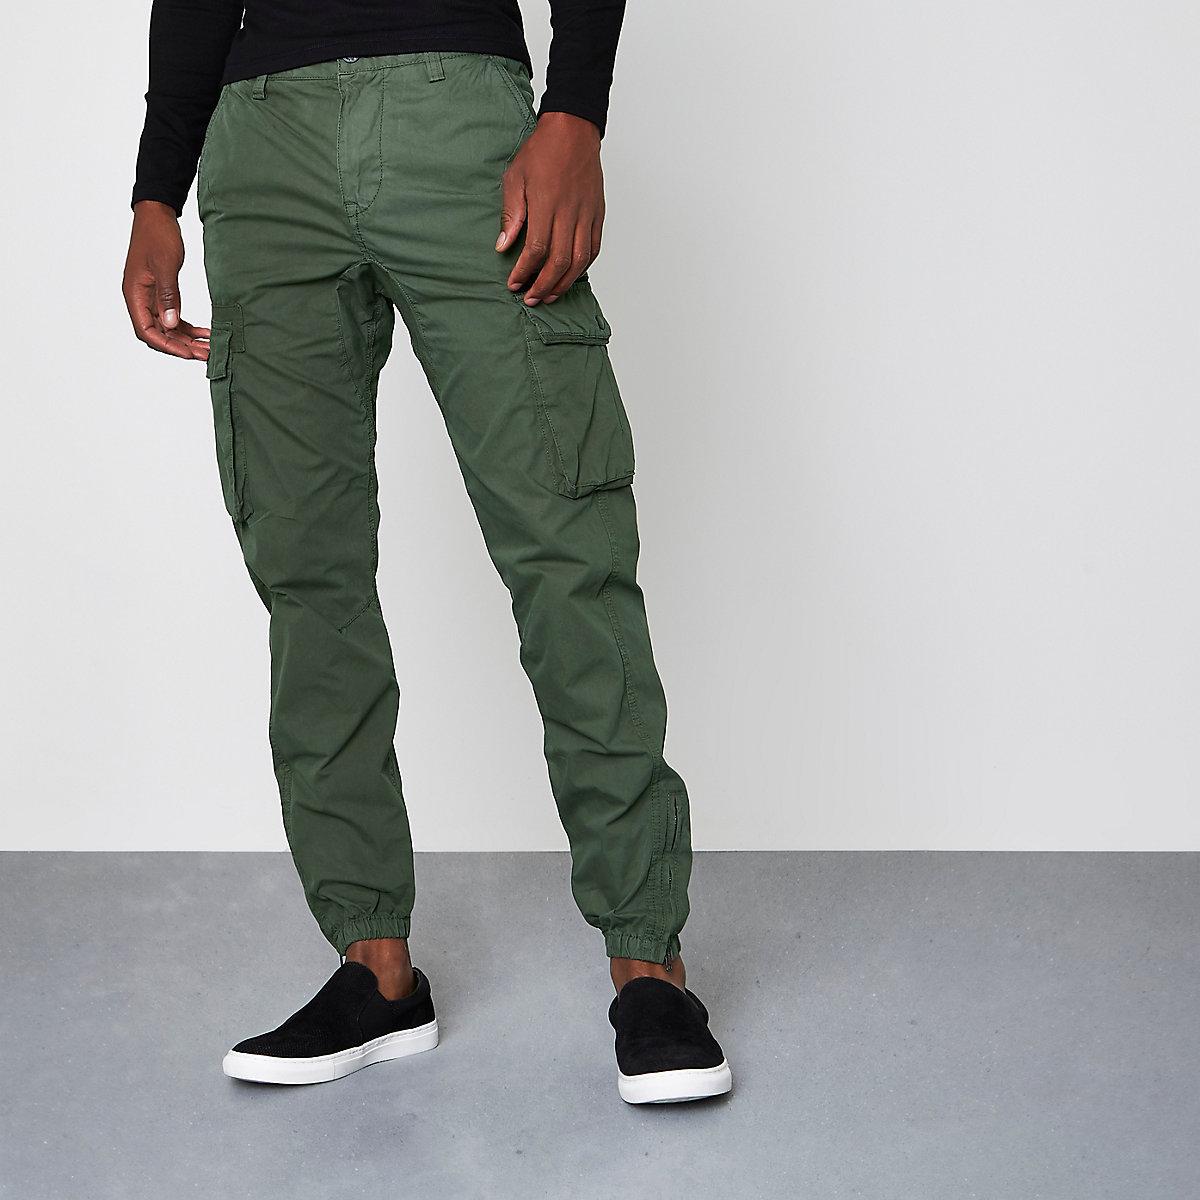 Khaki green cargo jogger trousers